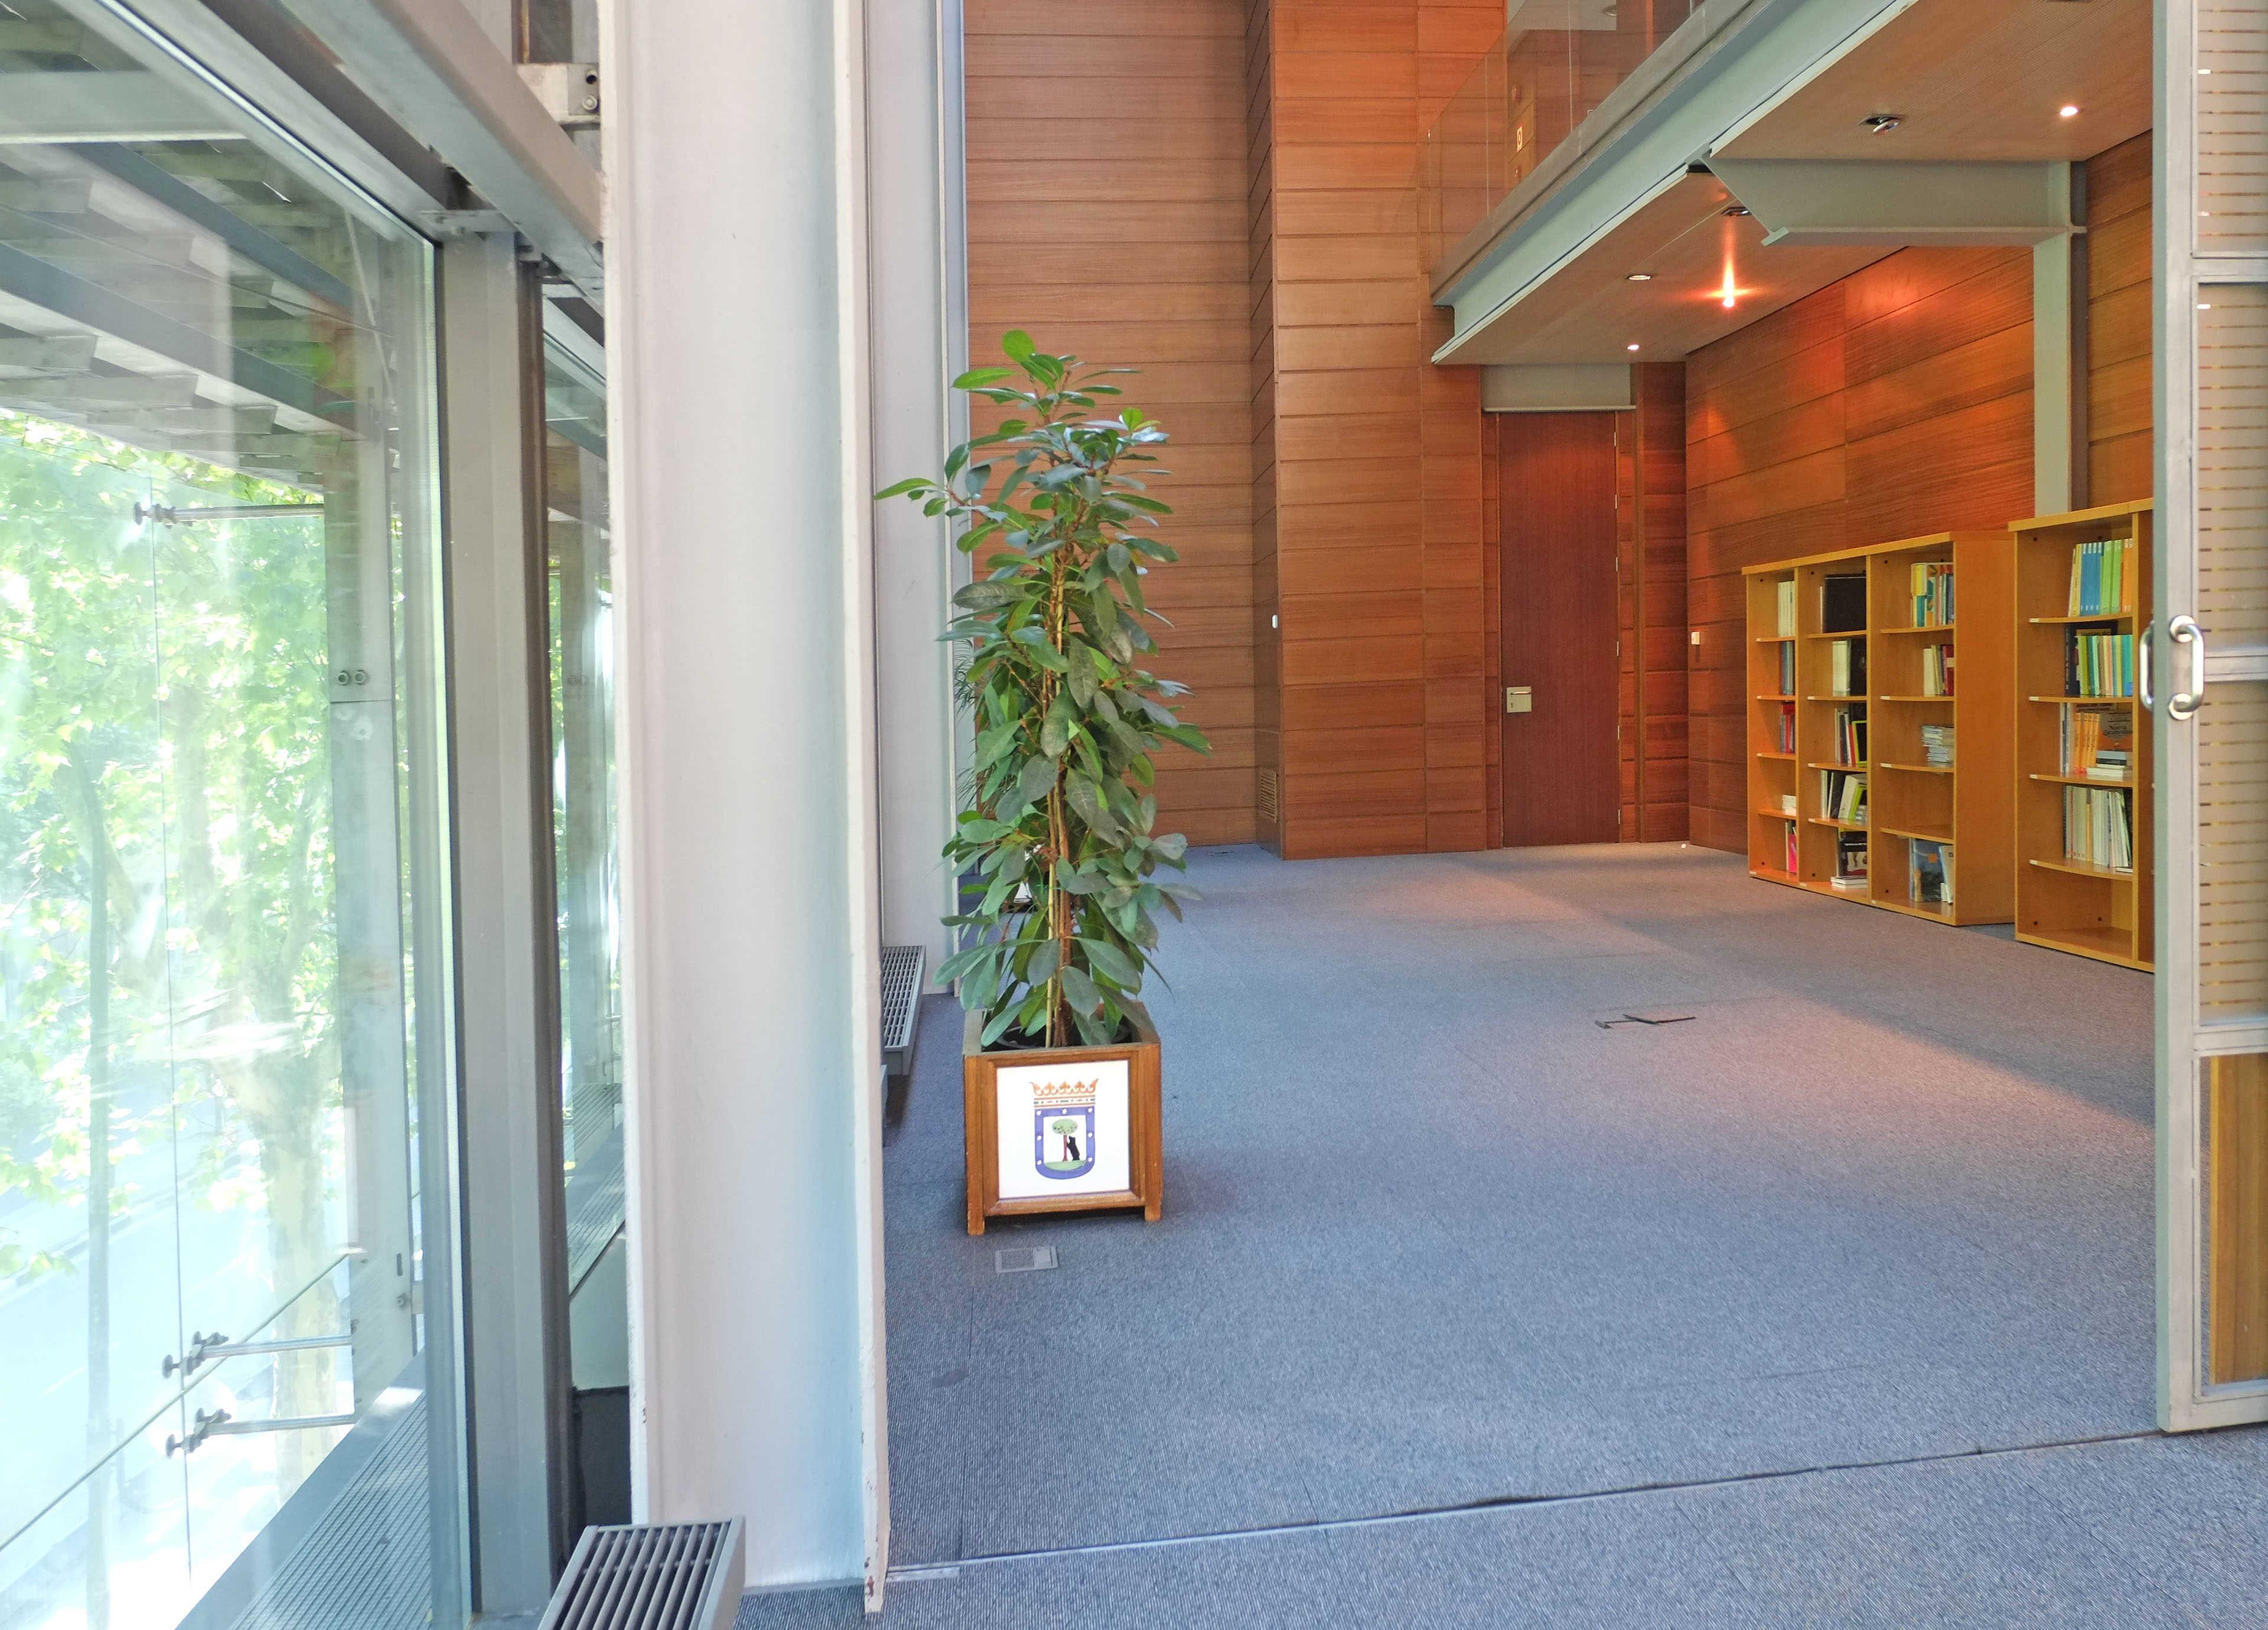 Zona retiro carmena destina un despacho de la junta de - Despachos grandes ...